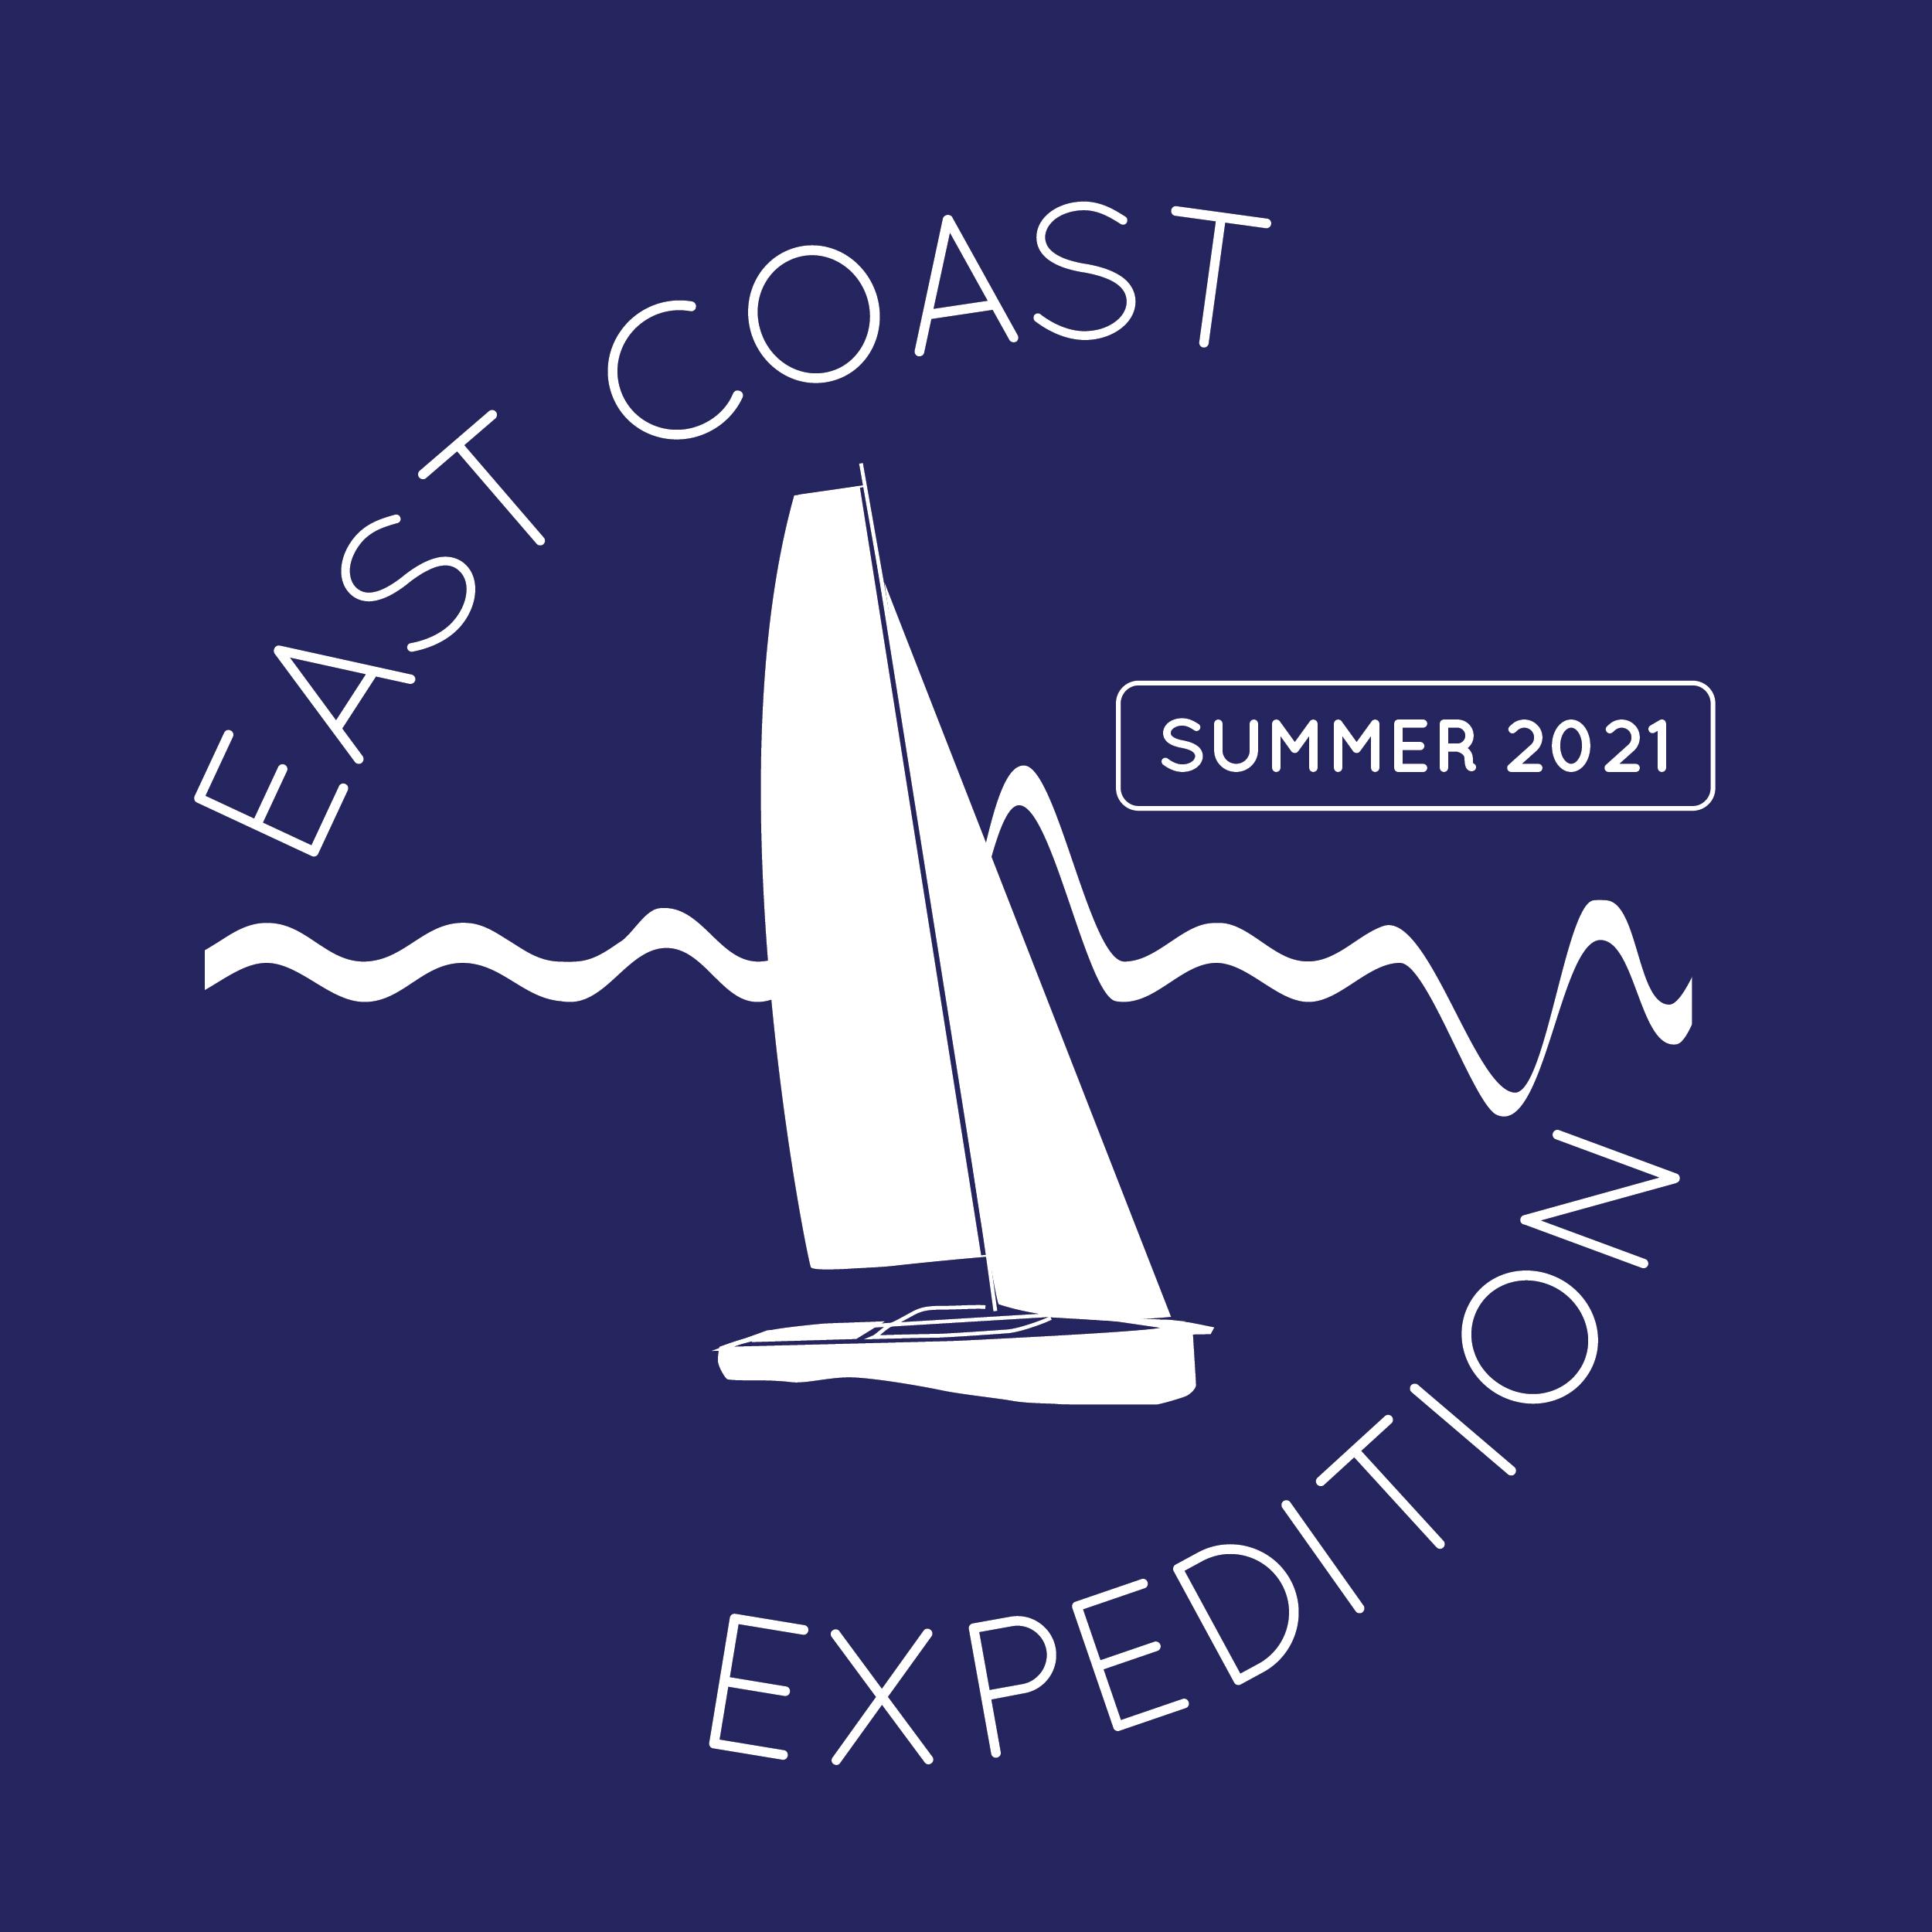 East Coast Expedition: Summer 2021